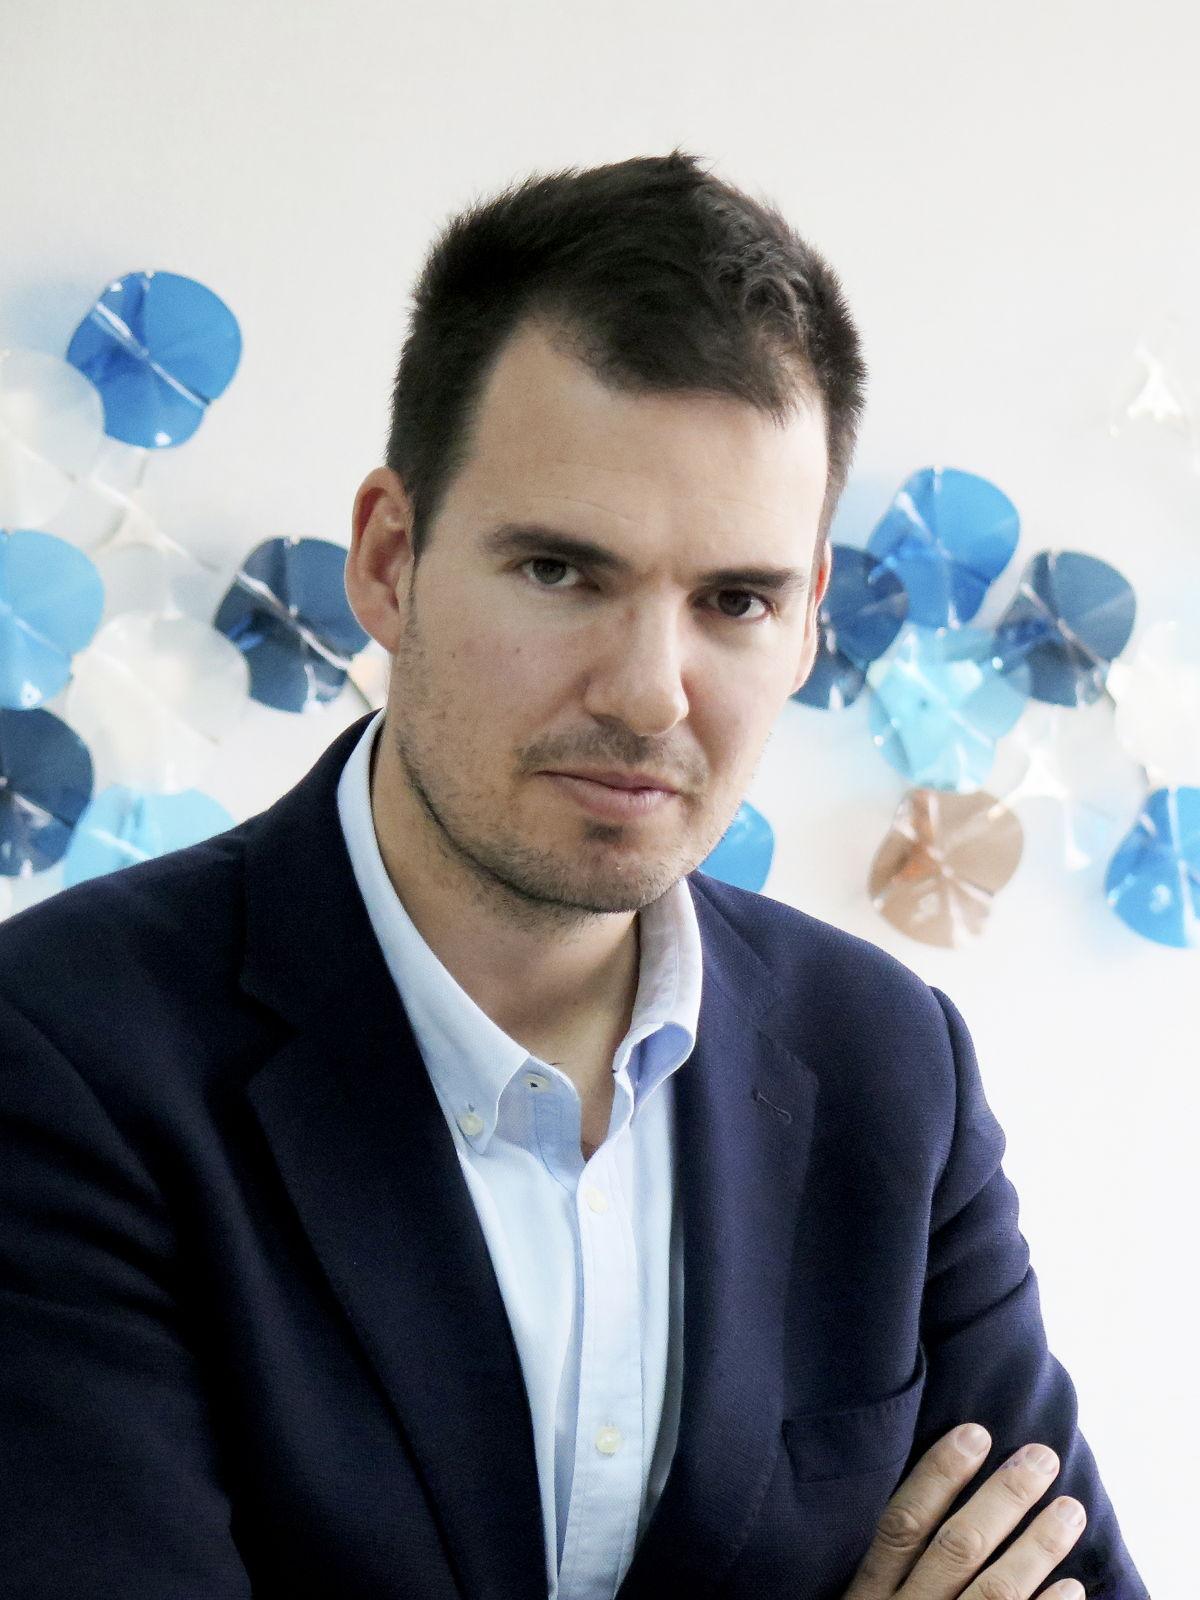 Roberto Molinos, Professor at Instituto De Empresa in Spain